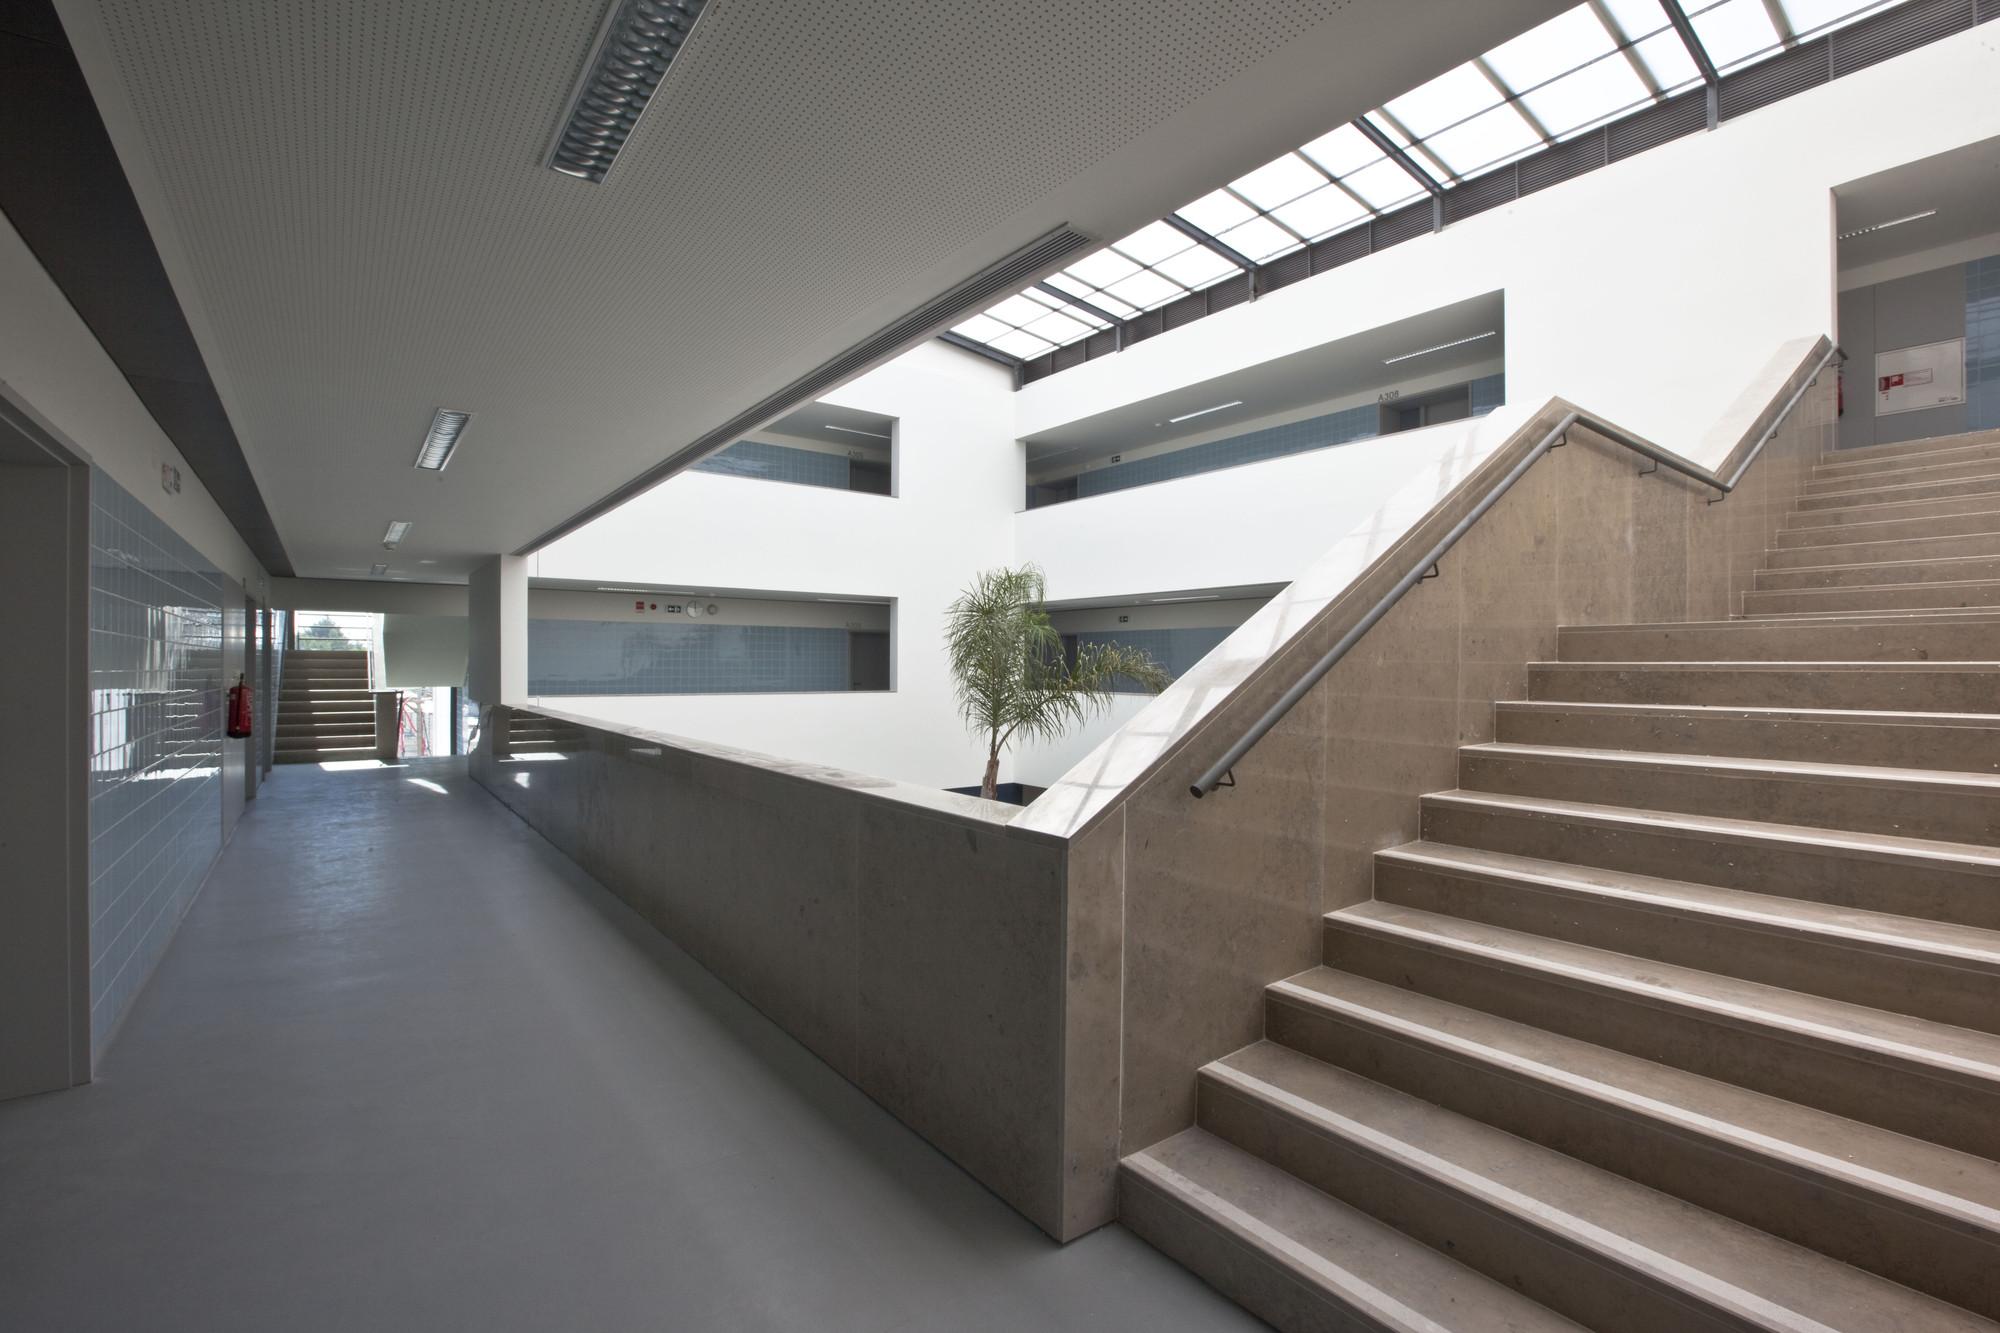 Gallery of jos macedo fragateiro secondary school - Atelier arquitectura ...